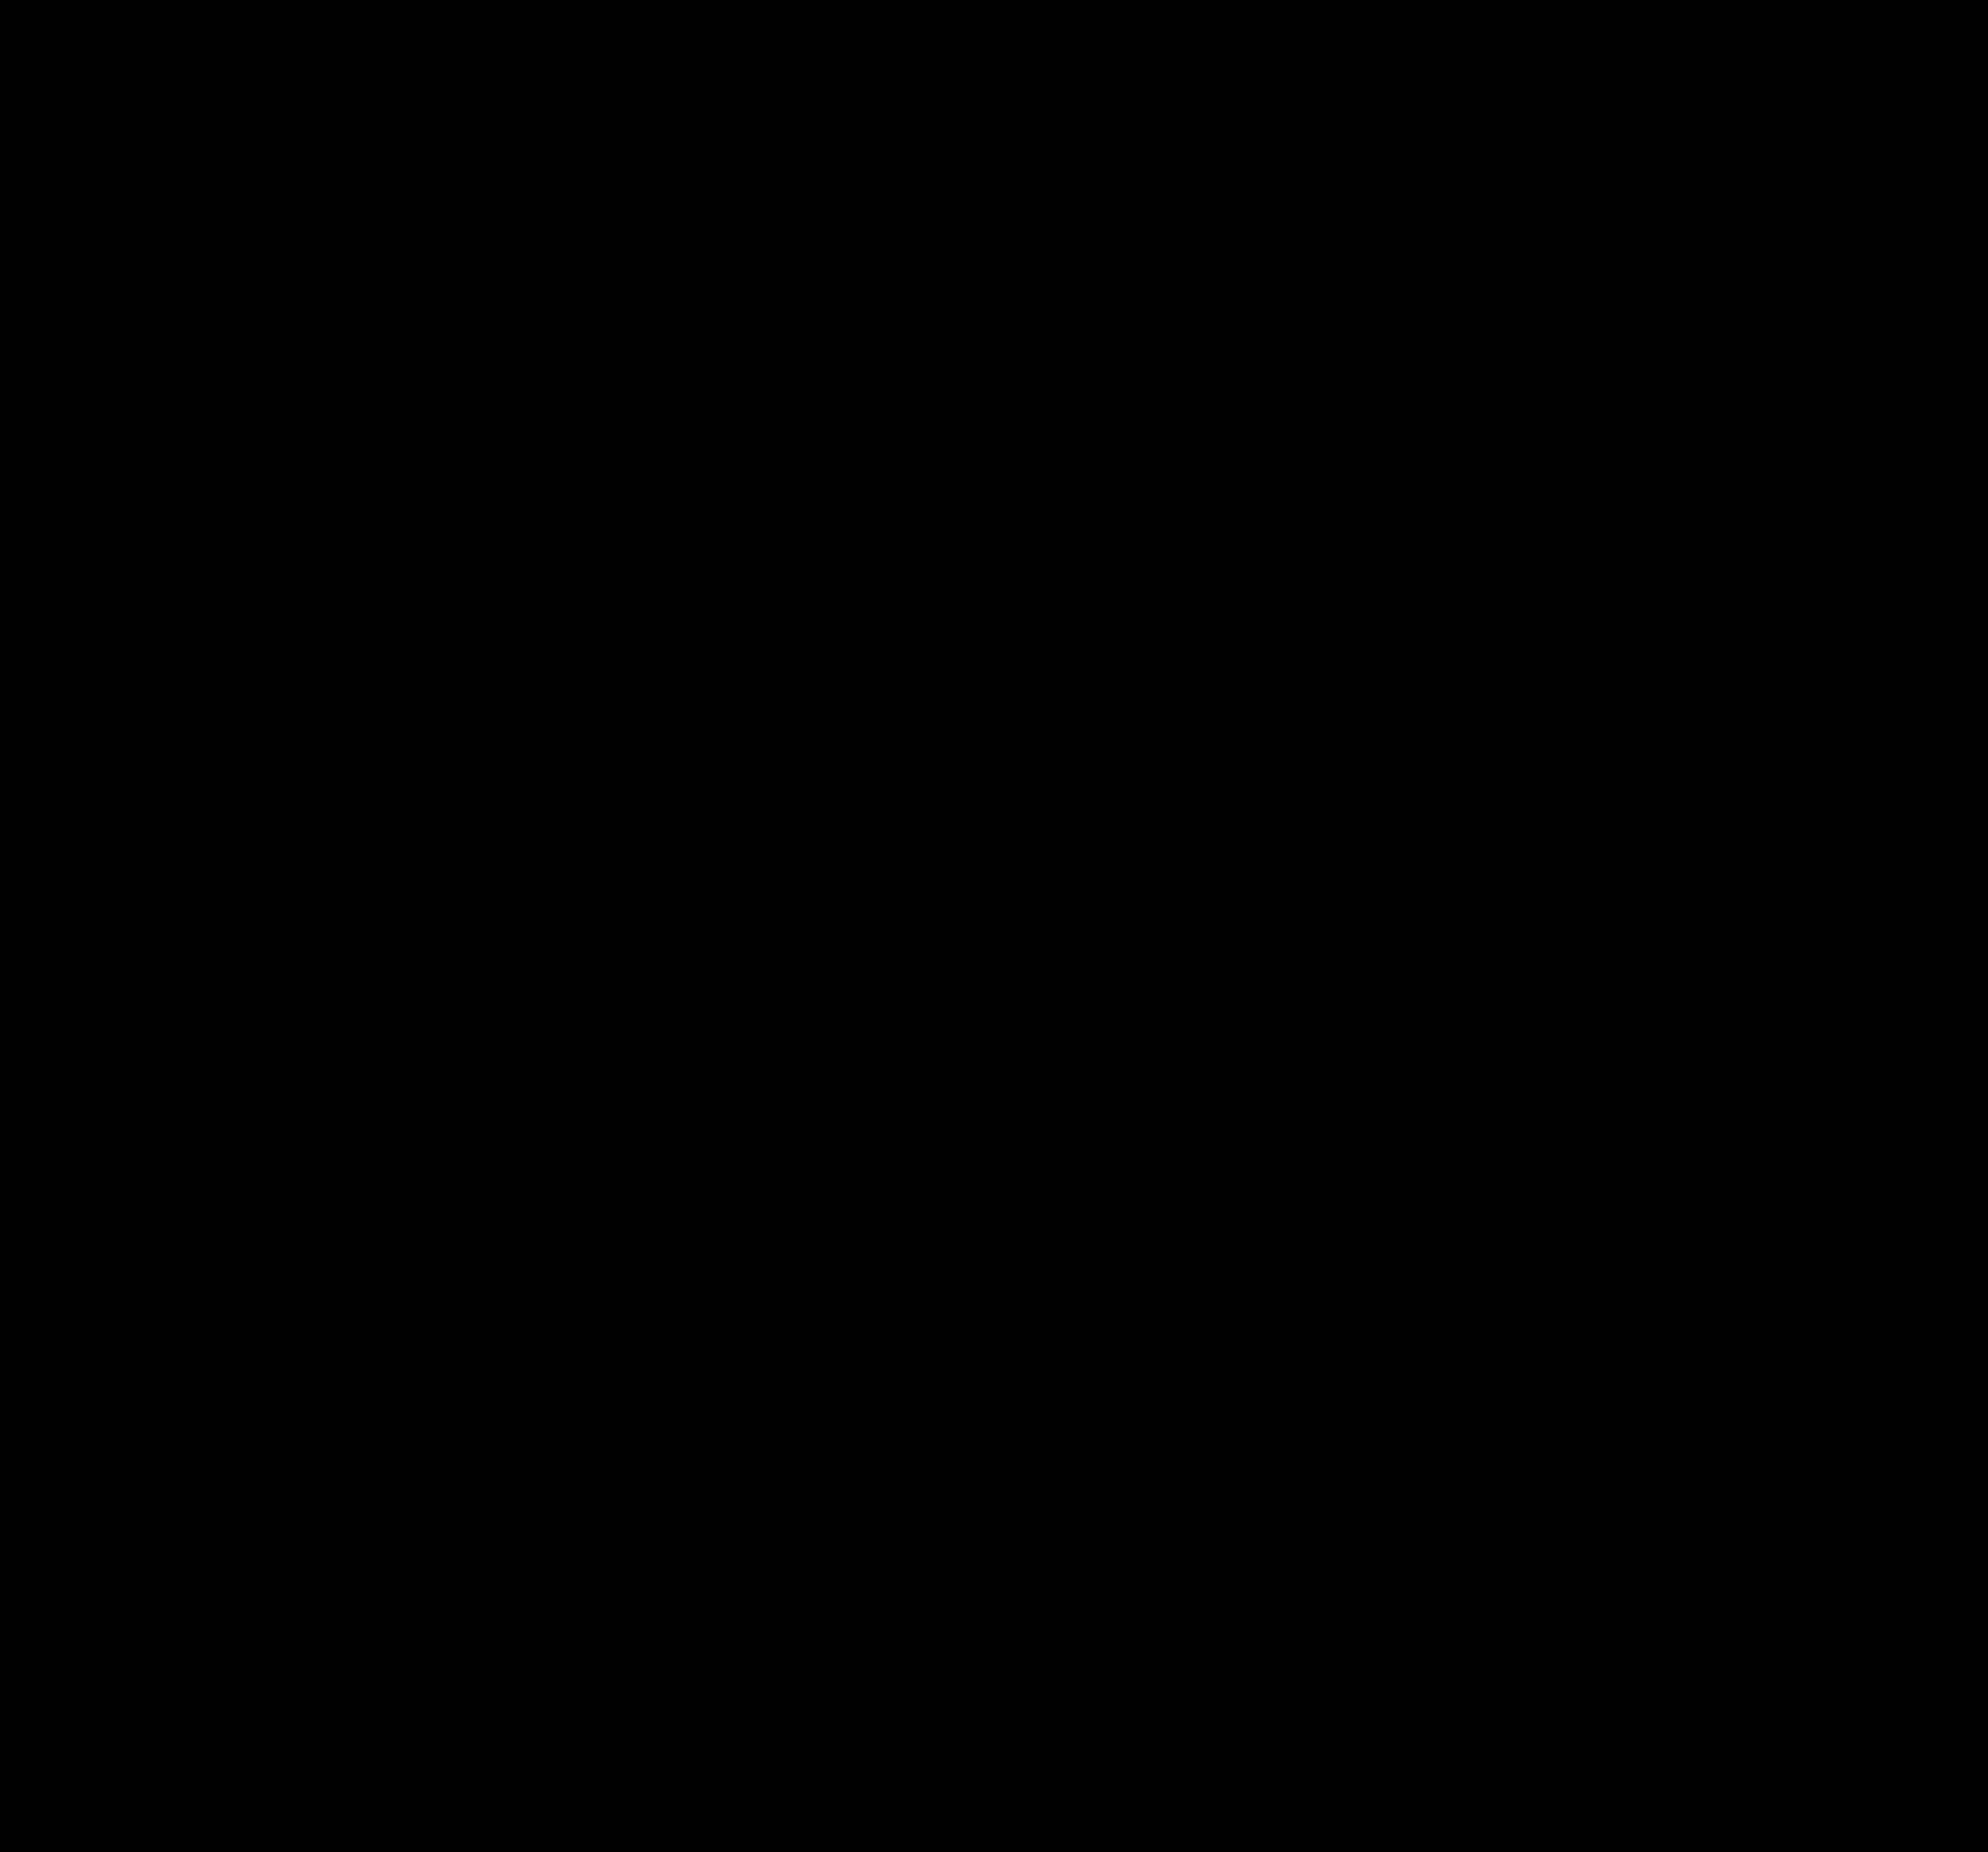 2142x1996 Clipart